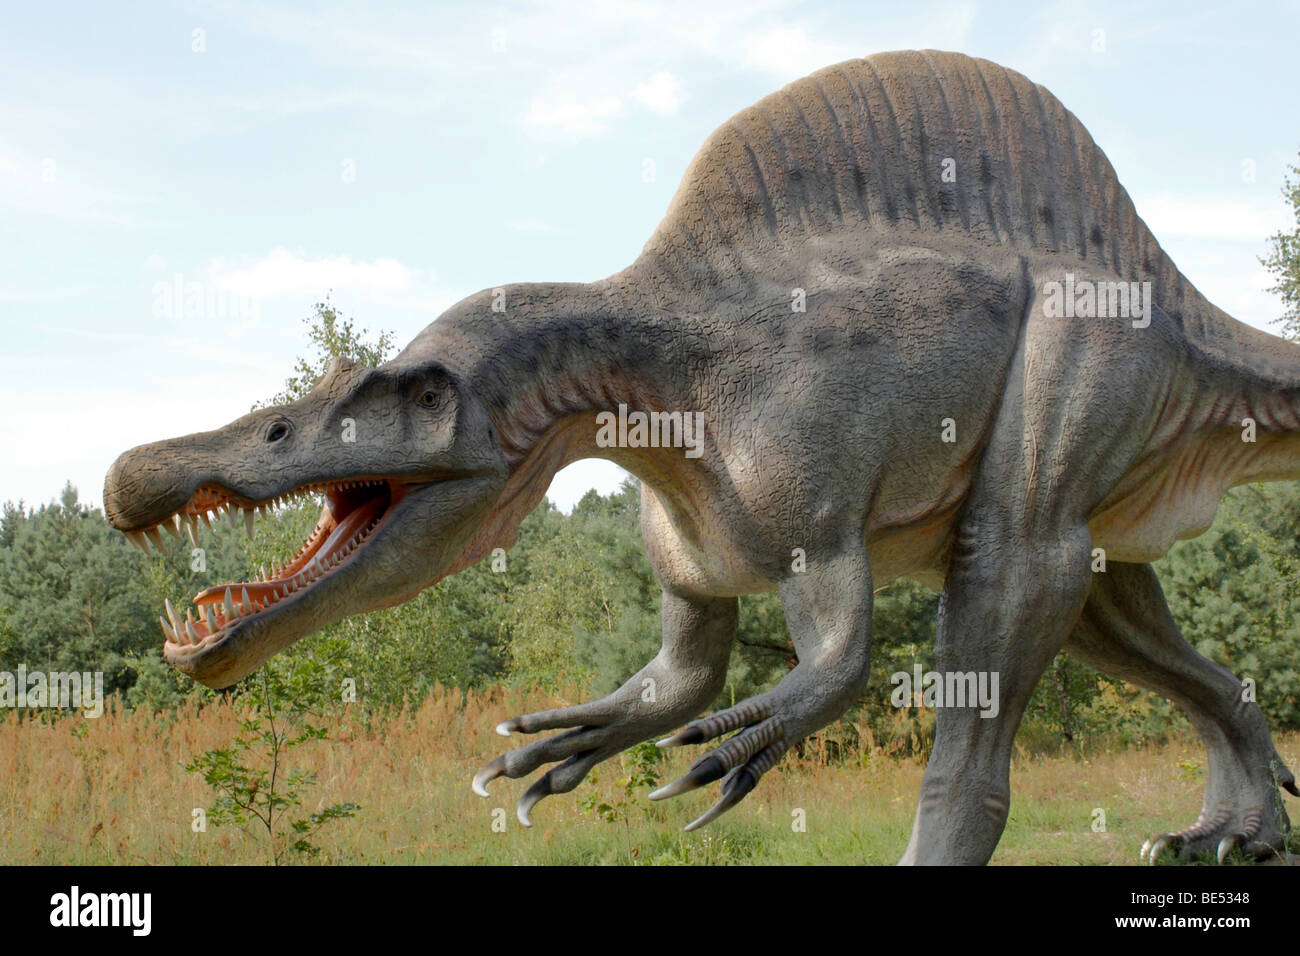 Prehistoric Park,  Spinosaurus, real size replica, 2009 - Stock Image